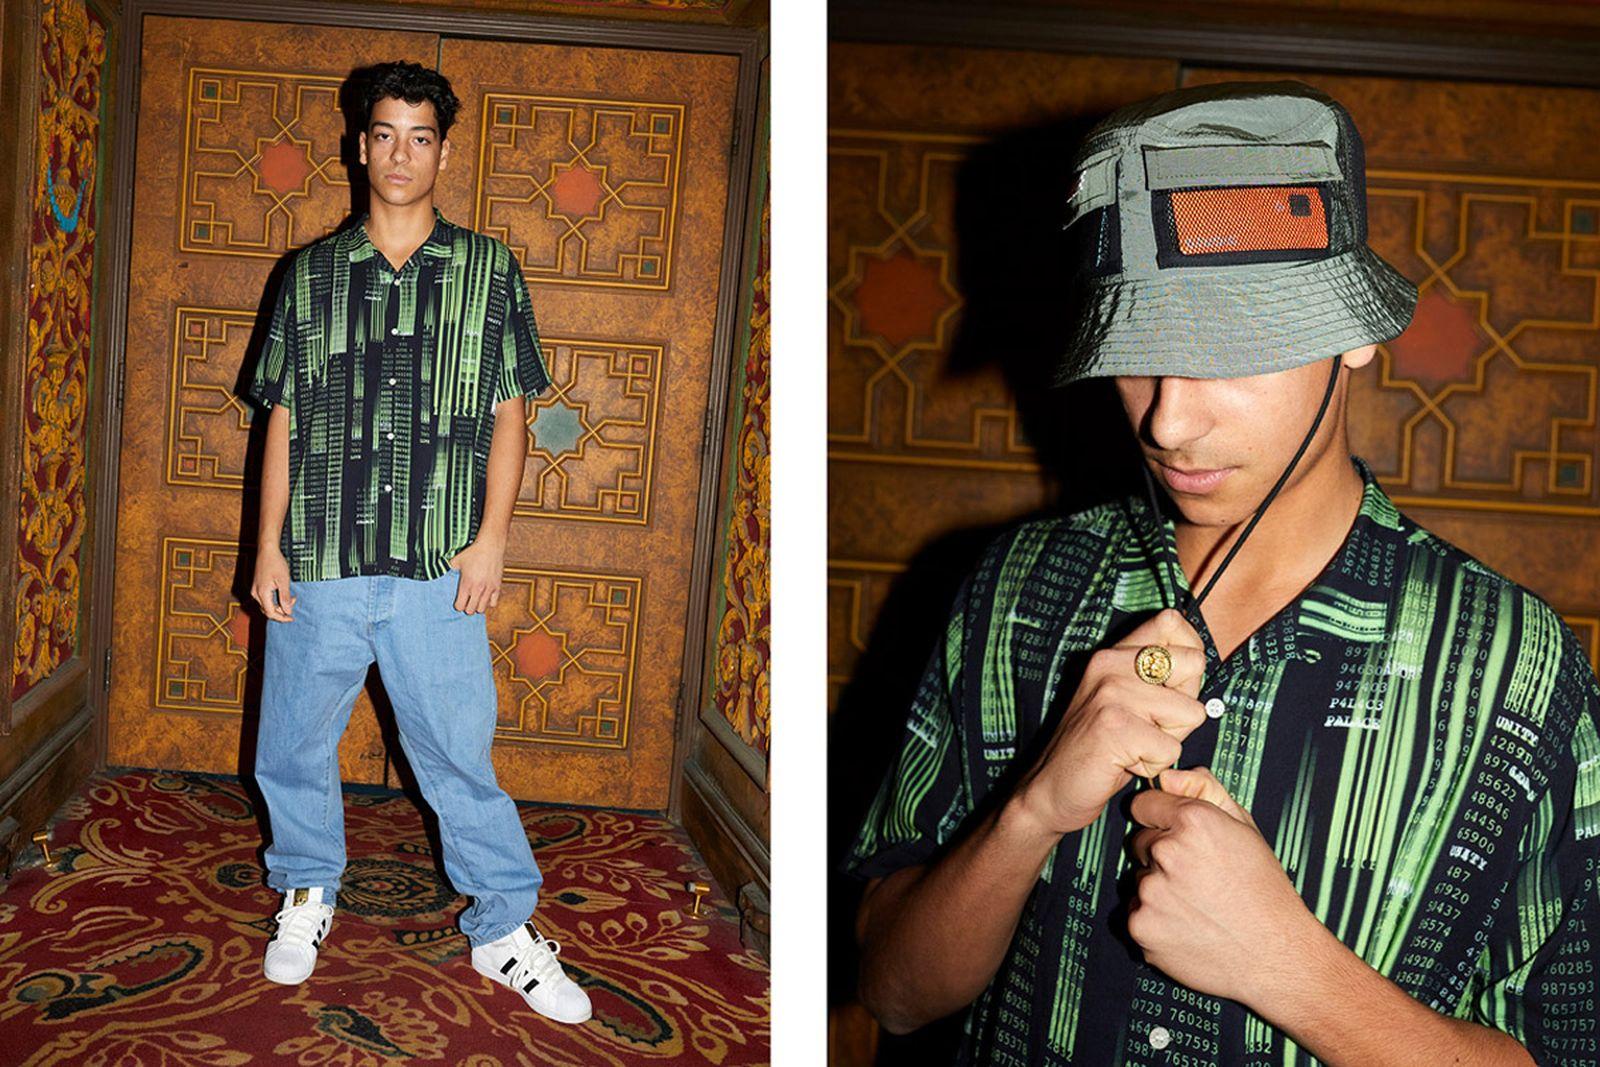 palace matrix shirt li ning sneakers best comments roundup Charlie Hunnam Garrett Hedlund Oscar Isaac